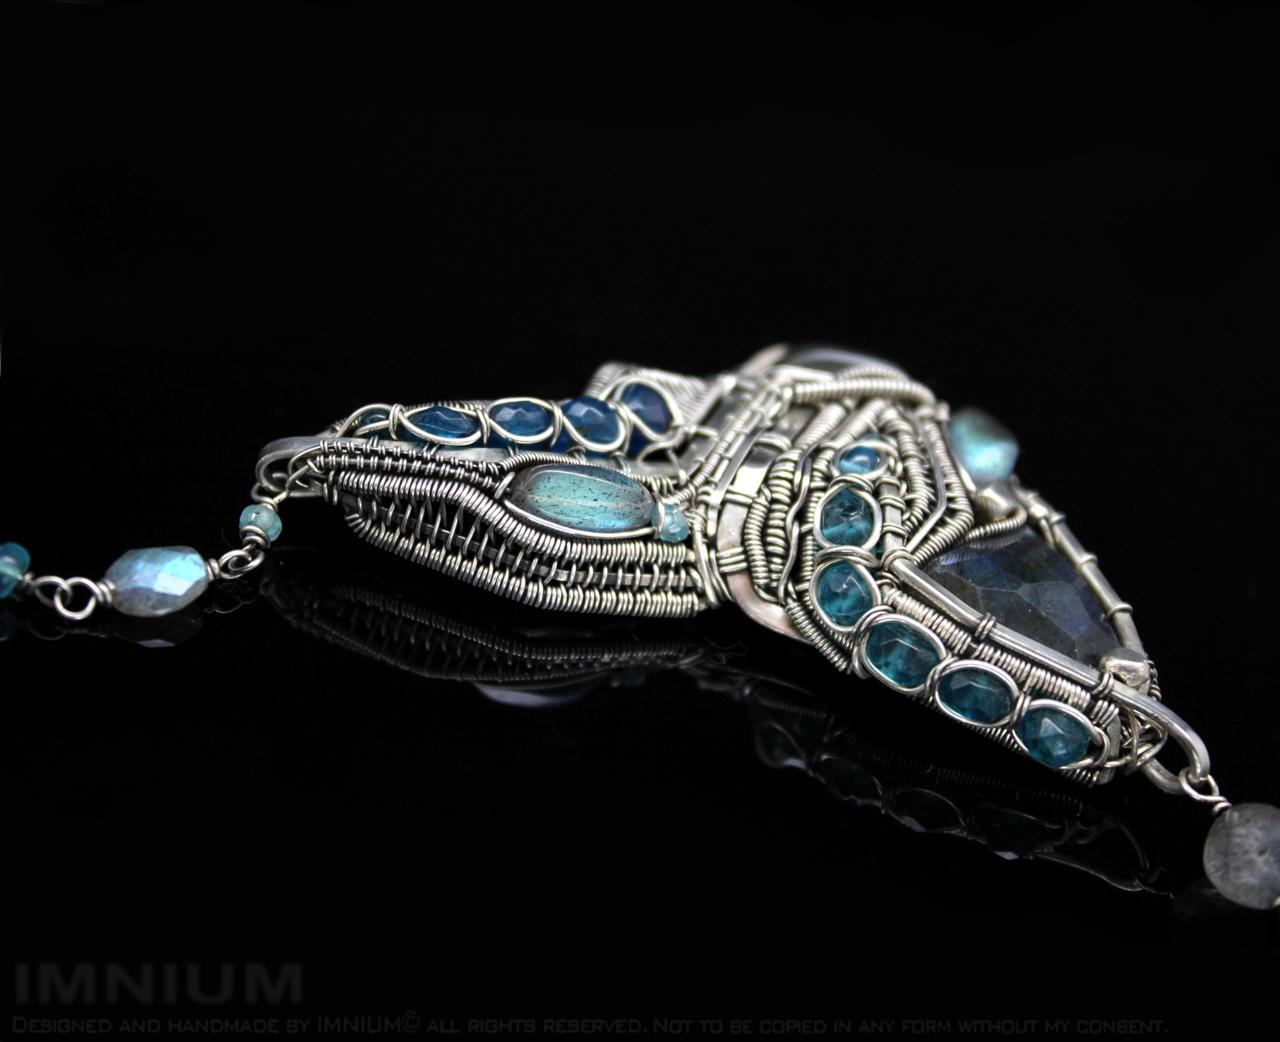 Machine necklace by IMNIUM